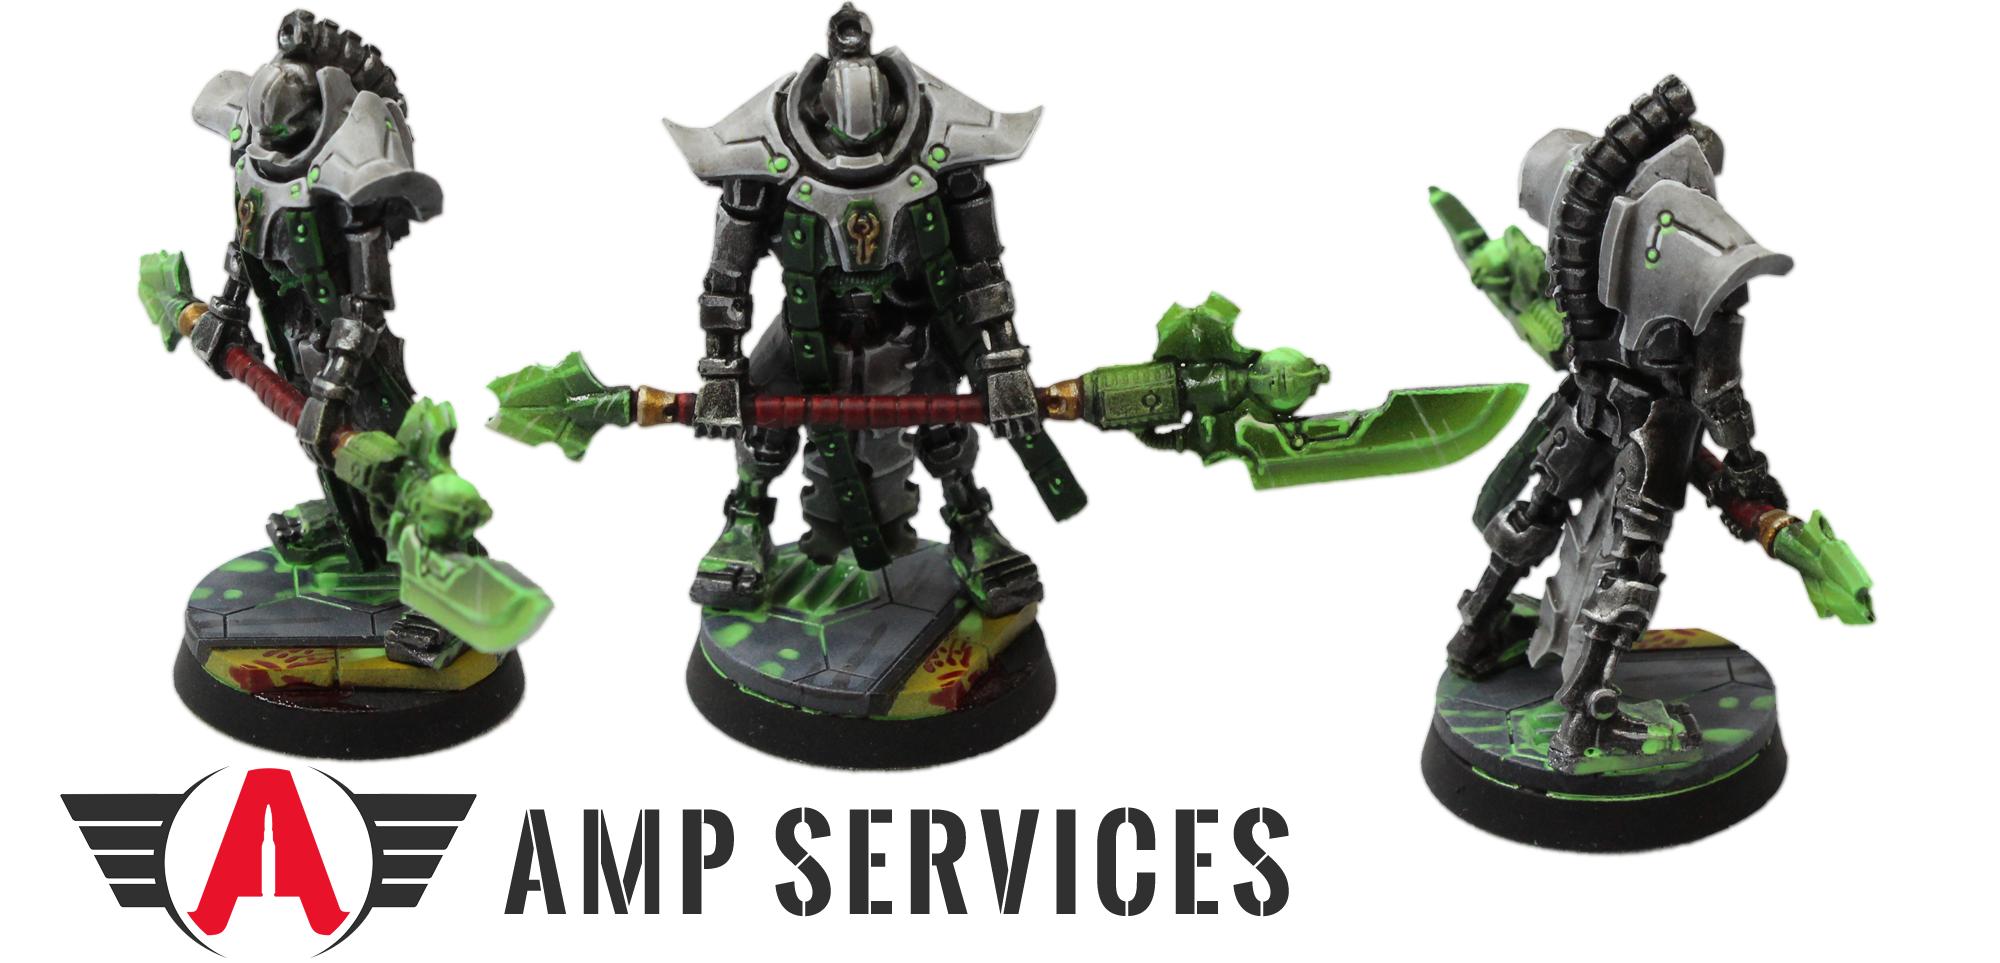 #thearmedpainter, Ampservices, Gamesworkshops, Miniatures, Necrons, Twitch, Warhammer 40,000